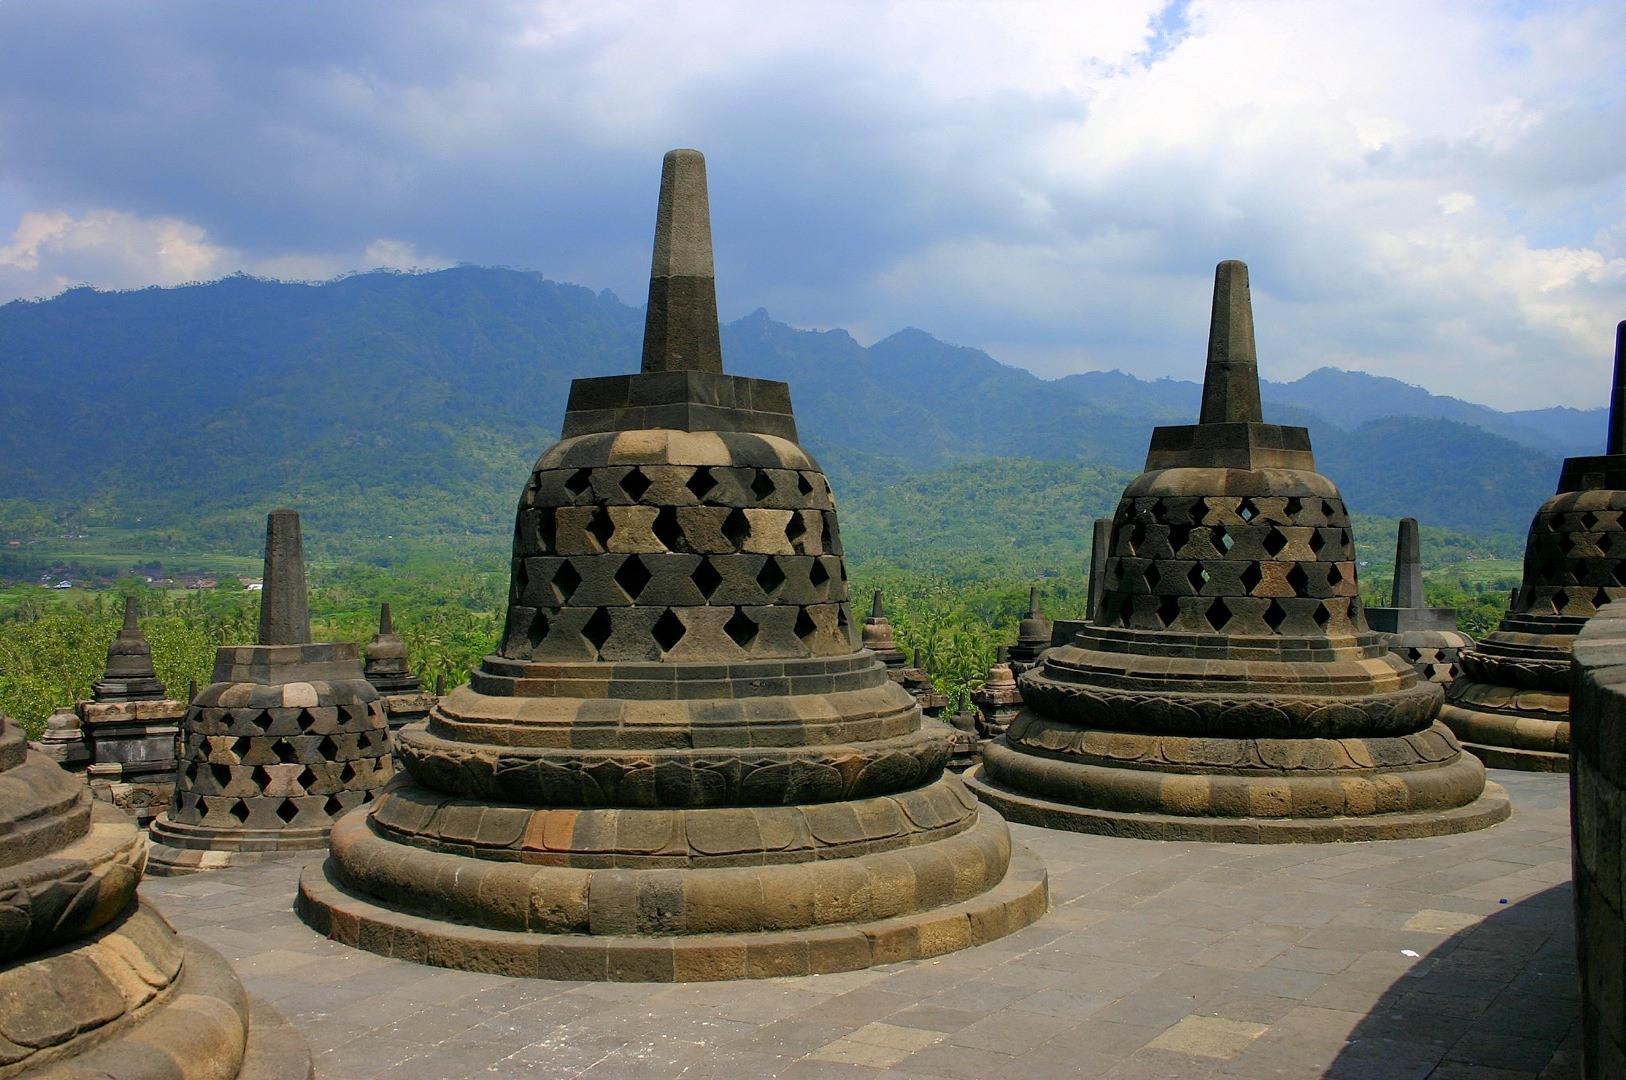 Borobudur-Mahayana-Buddhist-Temple-HD-%C3%971080-wallpaper-wp3803397